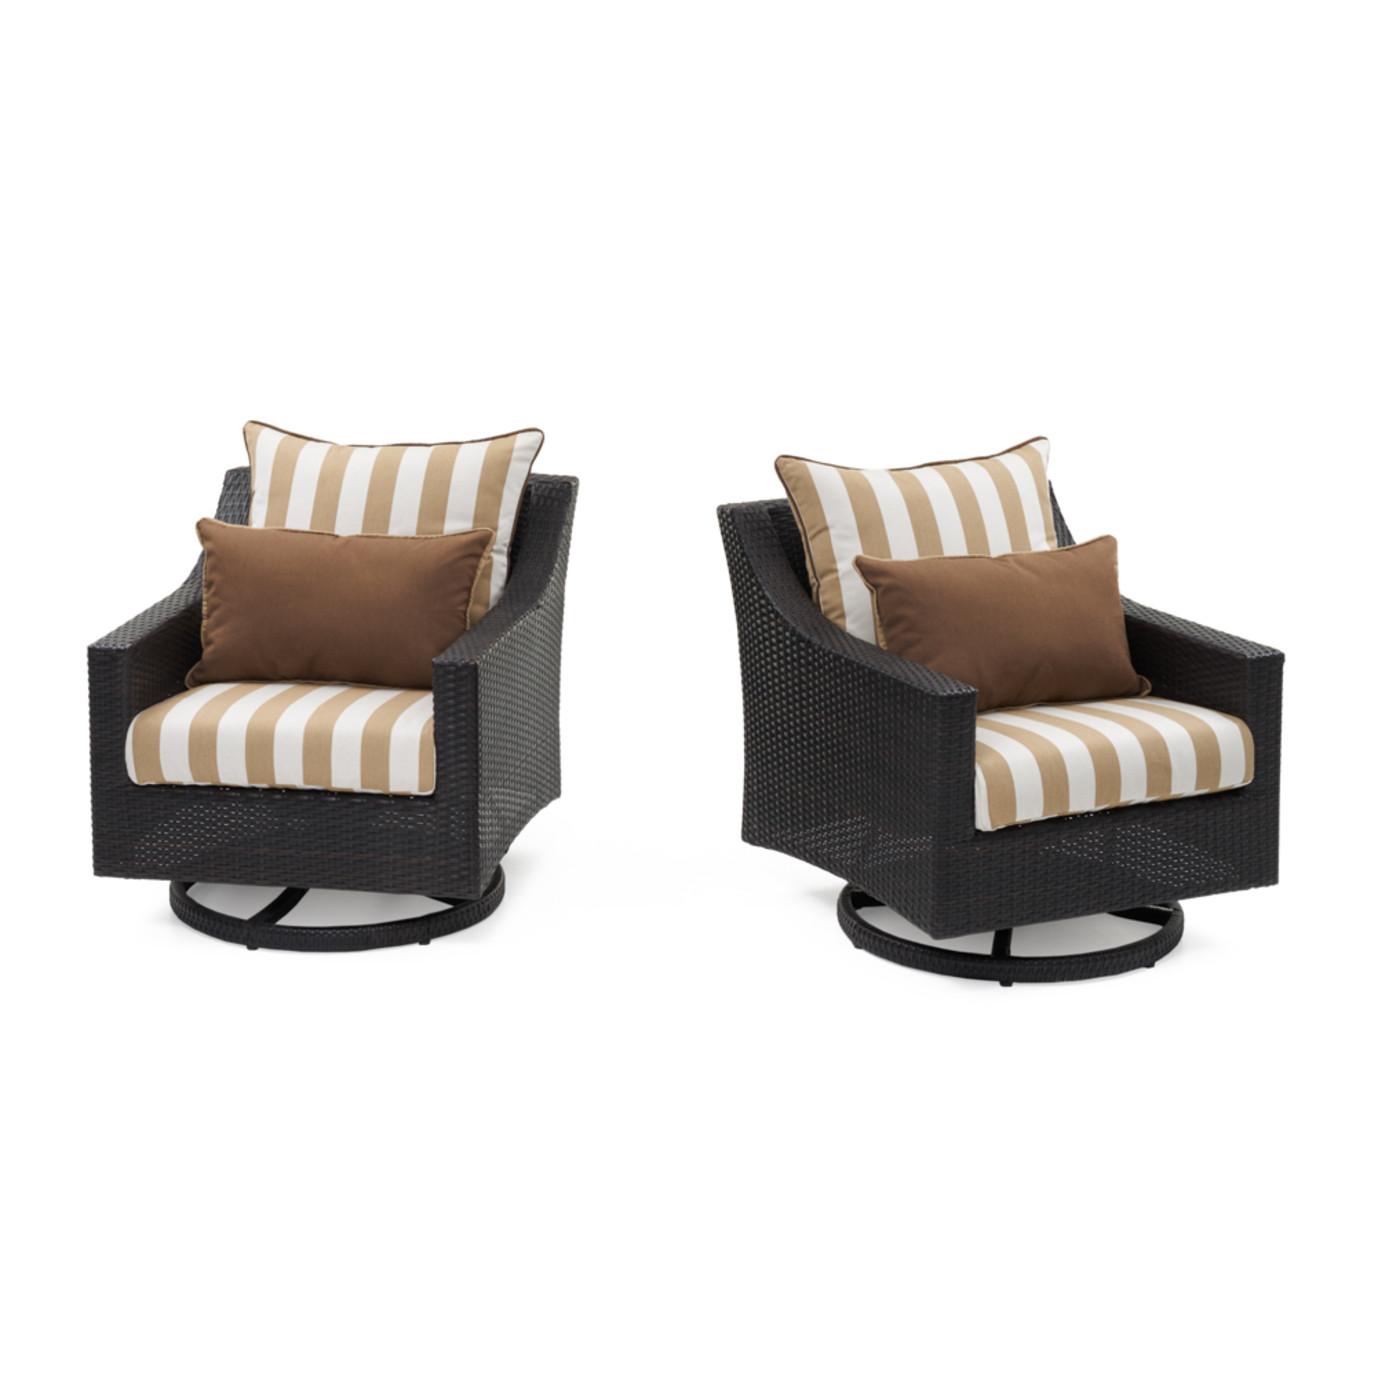 Deco™ Deluxe Motion Club Chairs - Maxim Beige Designer